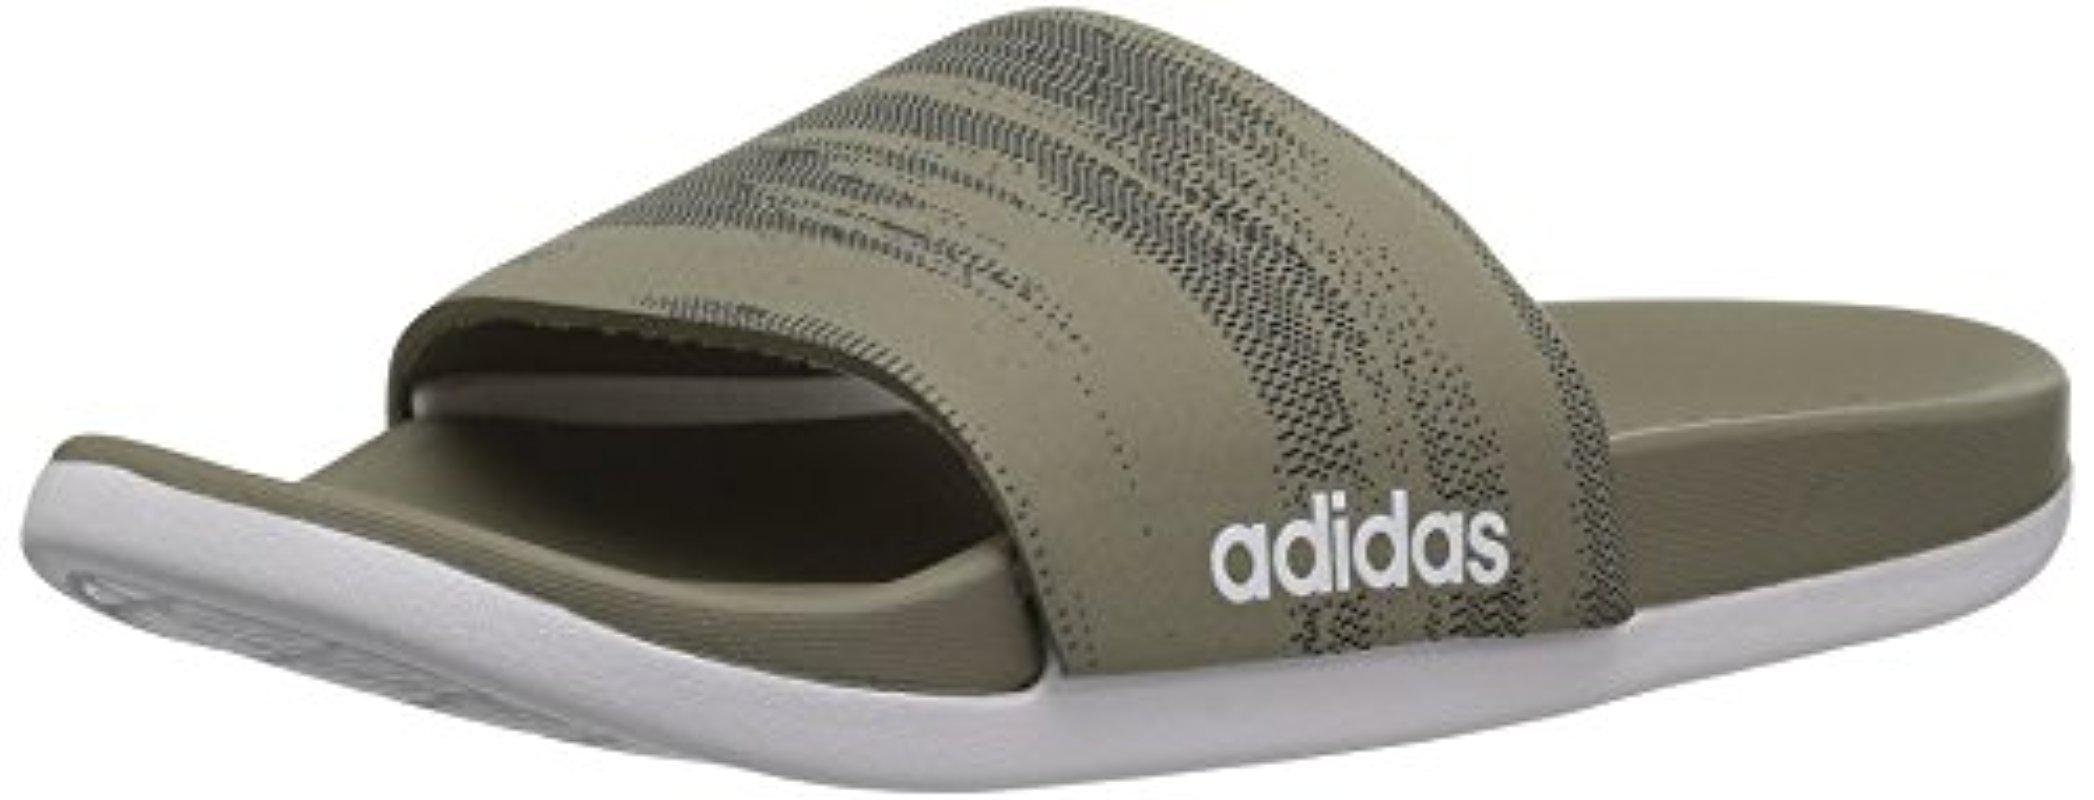 41c77d262 Lyst - Adidas Originals Adidas Adilette Cf+ Link Gr Slide Sandal ...